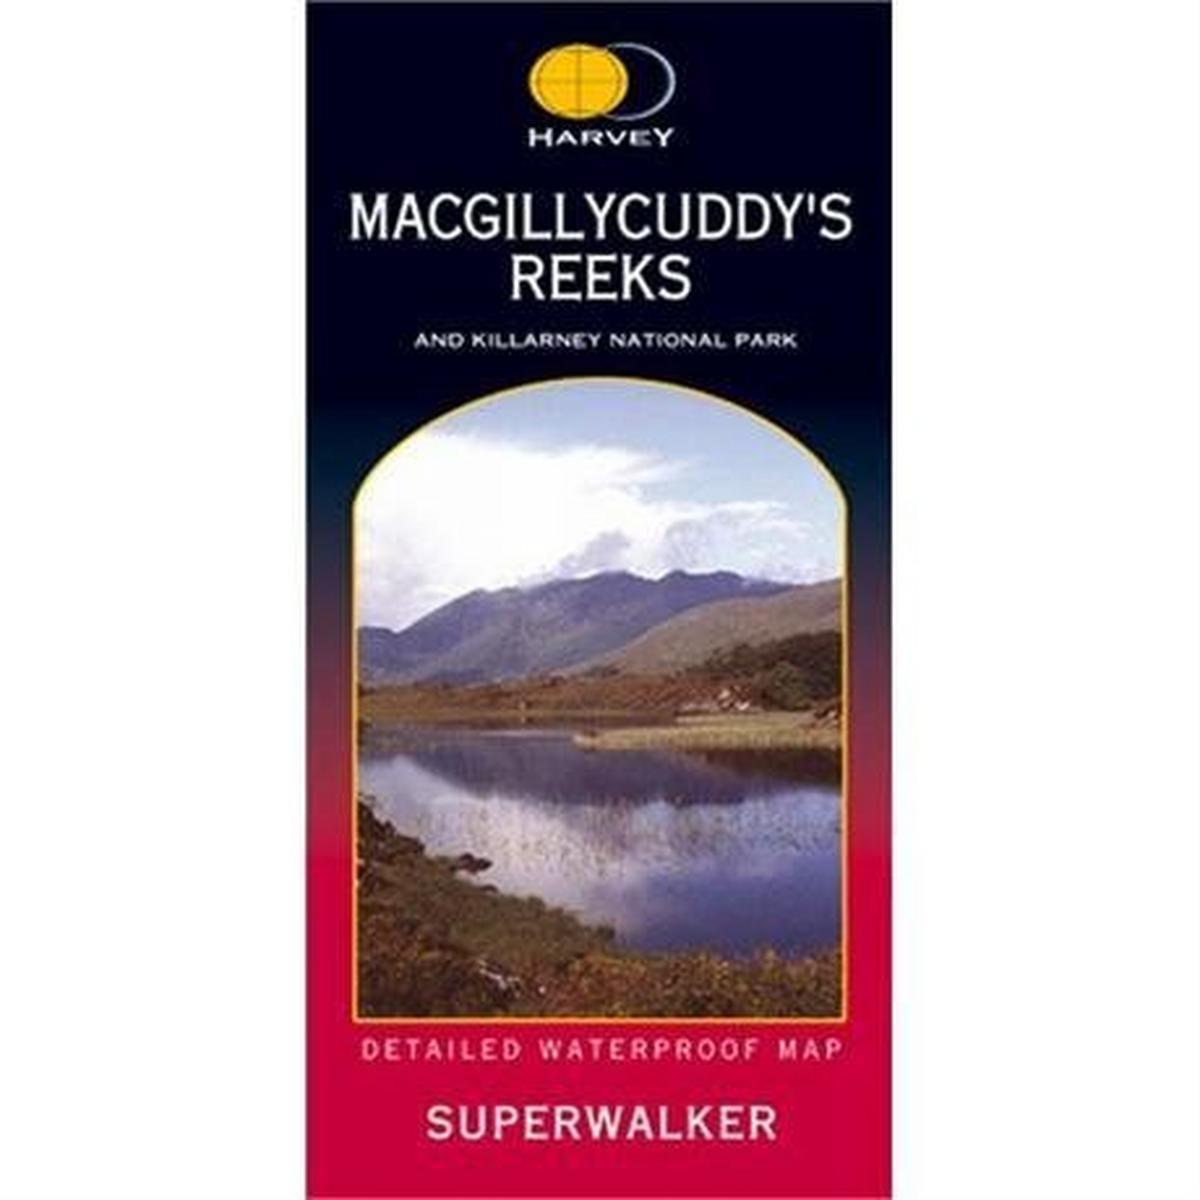 Harveys Ireland Map Harvey - Superwalker: MacGillycuddy's Reeks